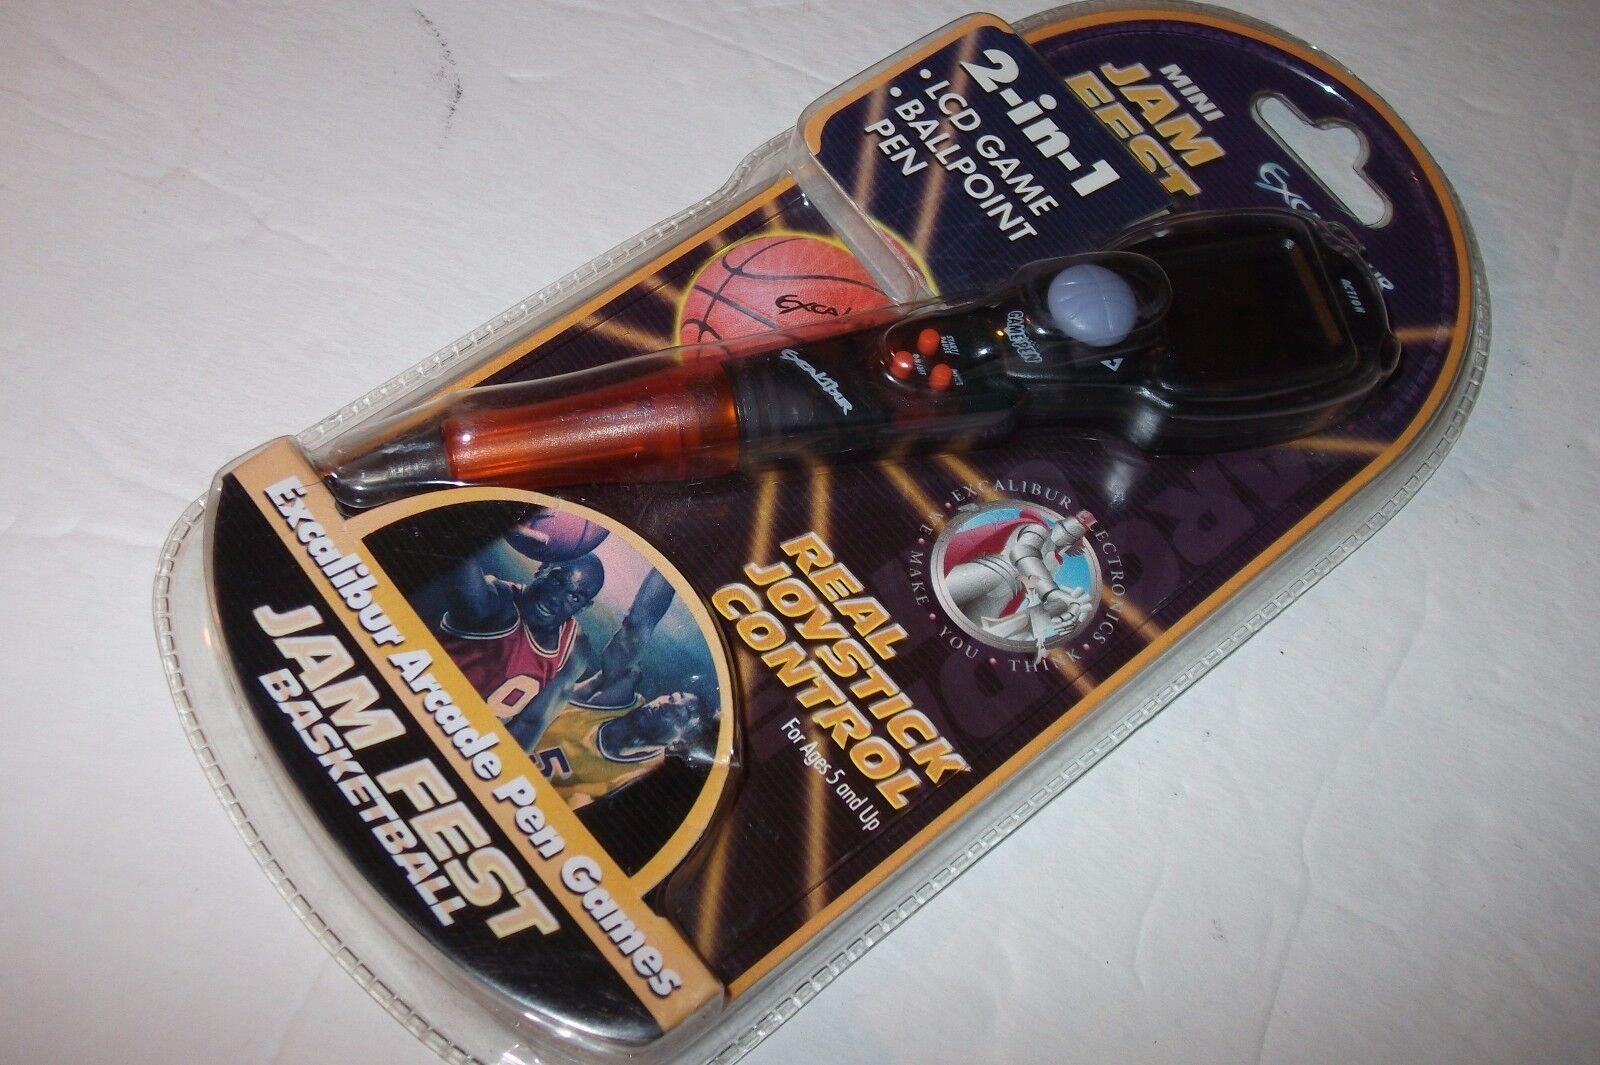 NEW Excalibur Mini Jam Fest Basketball LCD Arcade Pen Game - Sealed - FREE SHIP